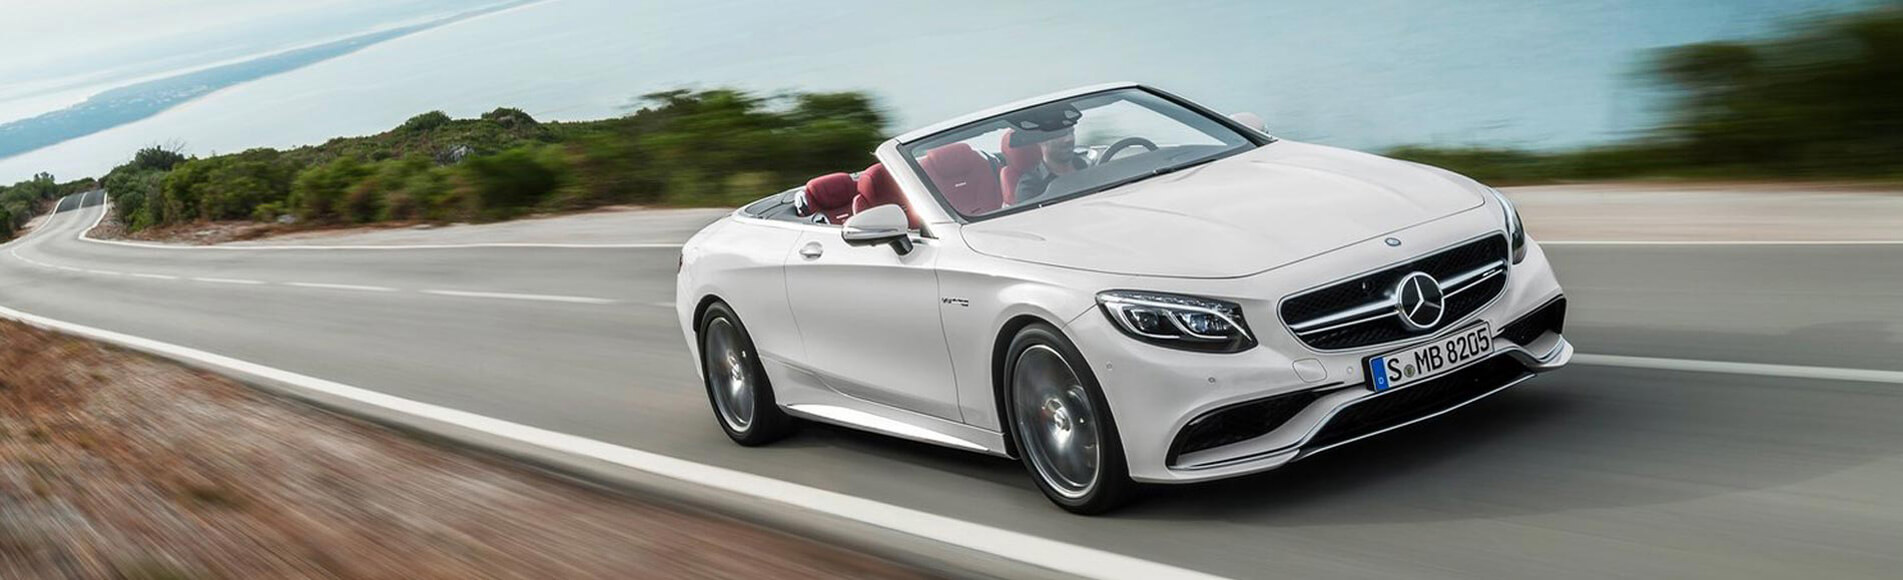 David rice auto sales used car dealer in kalamazoo for Mercedes benz dealership kalamazoo